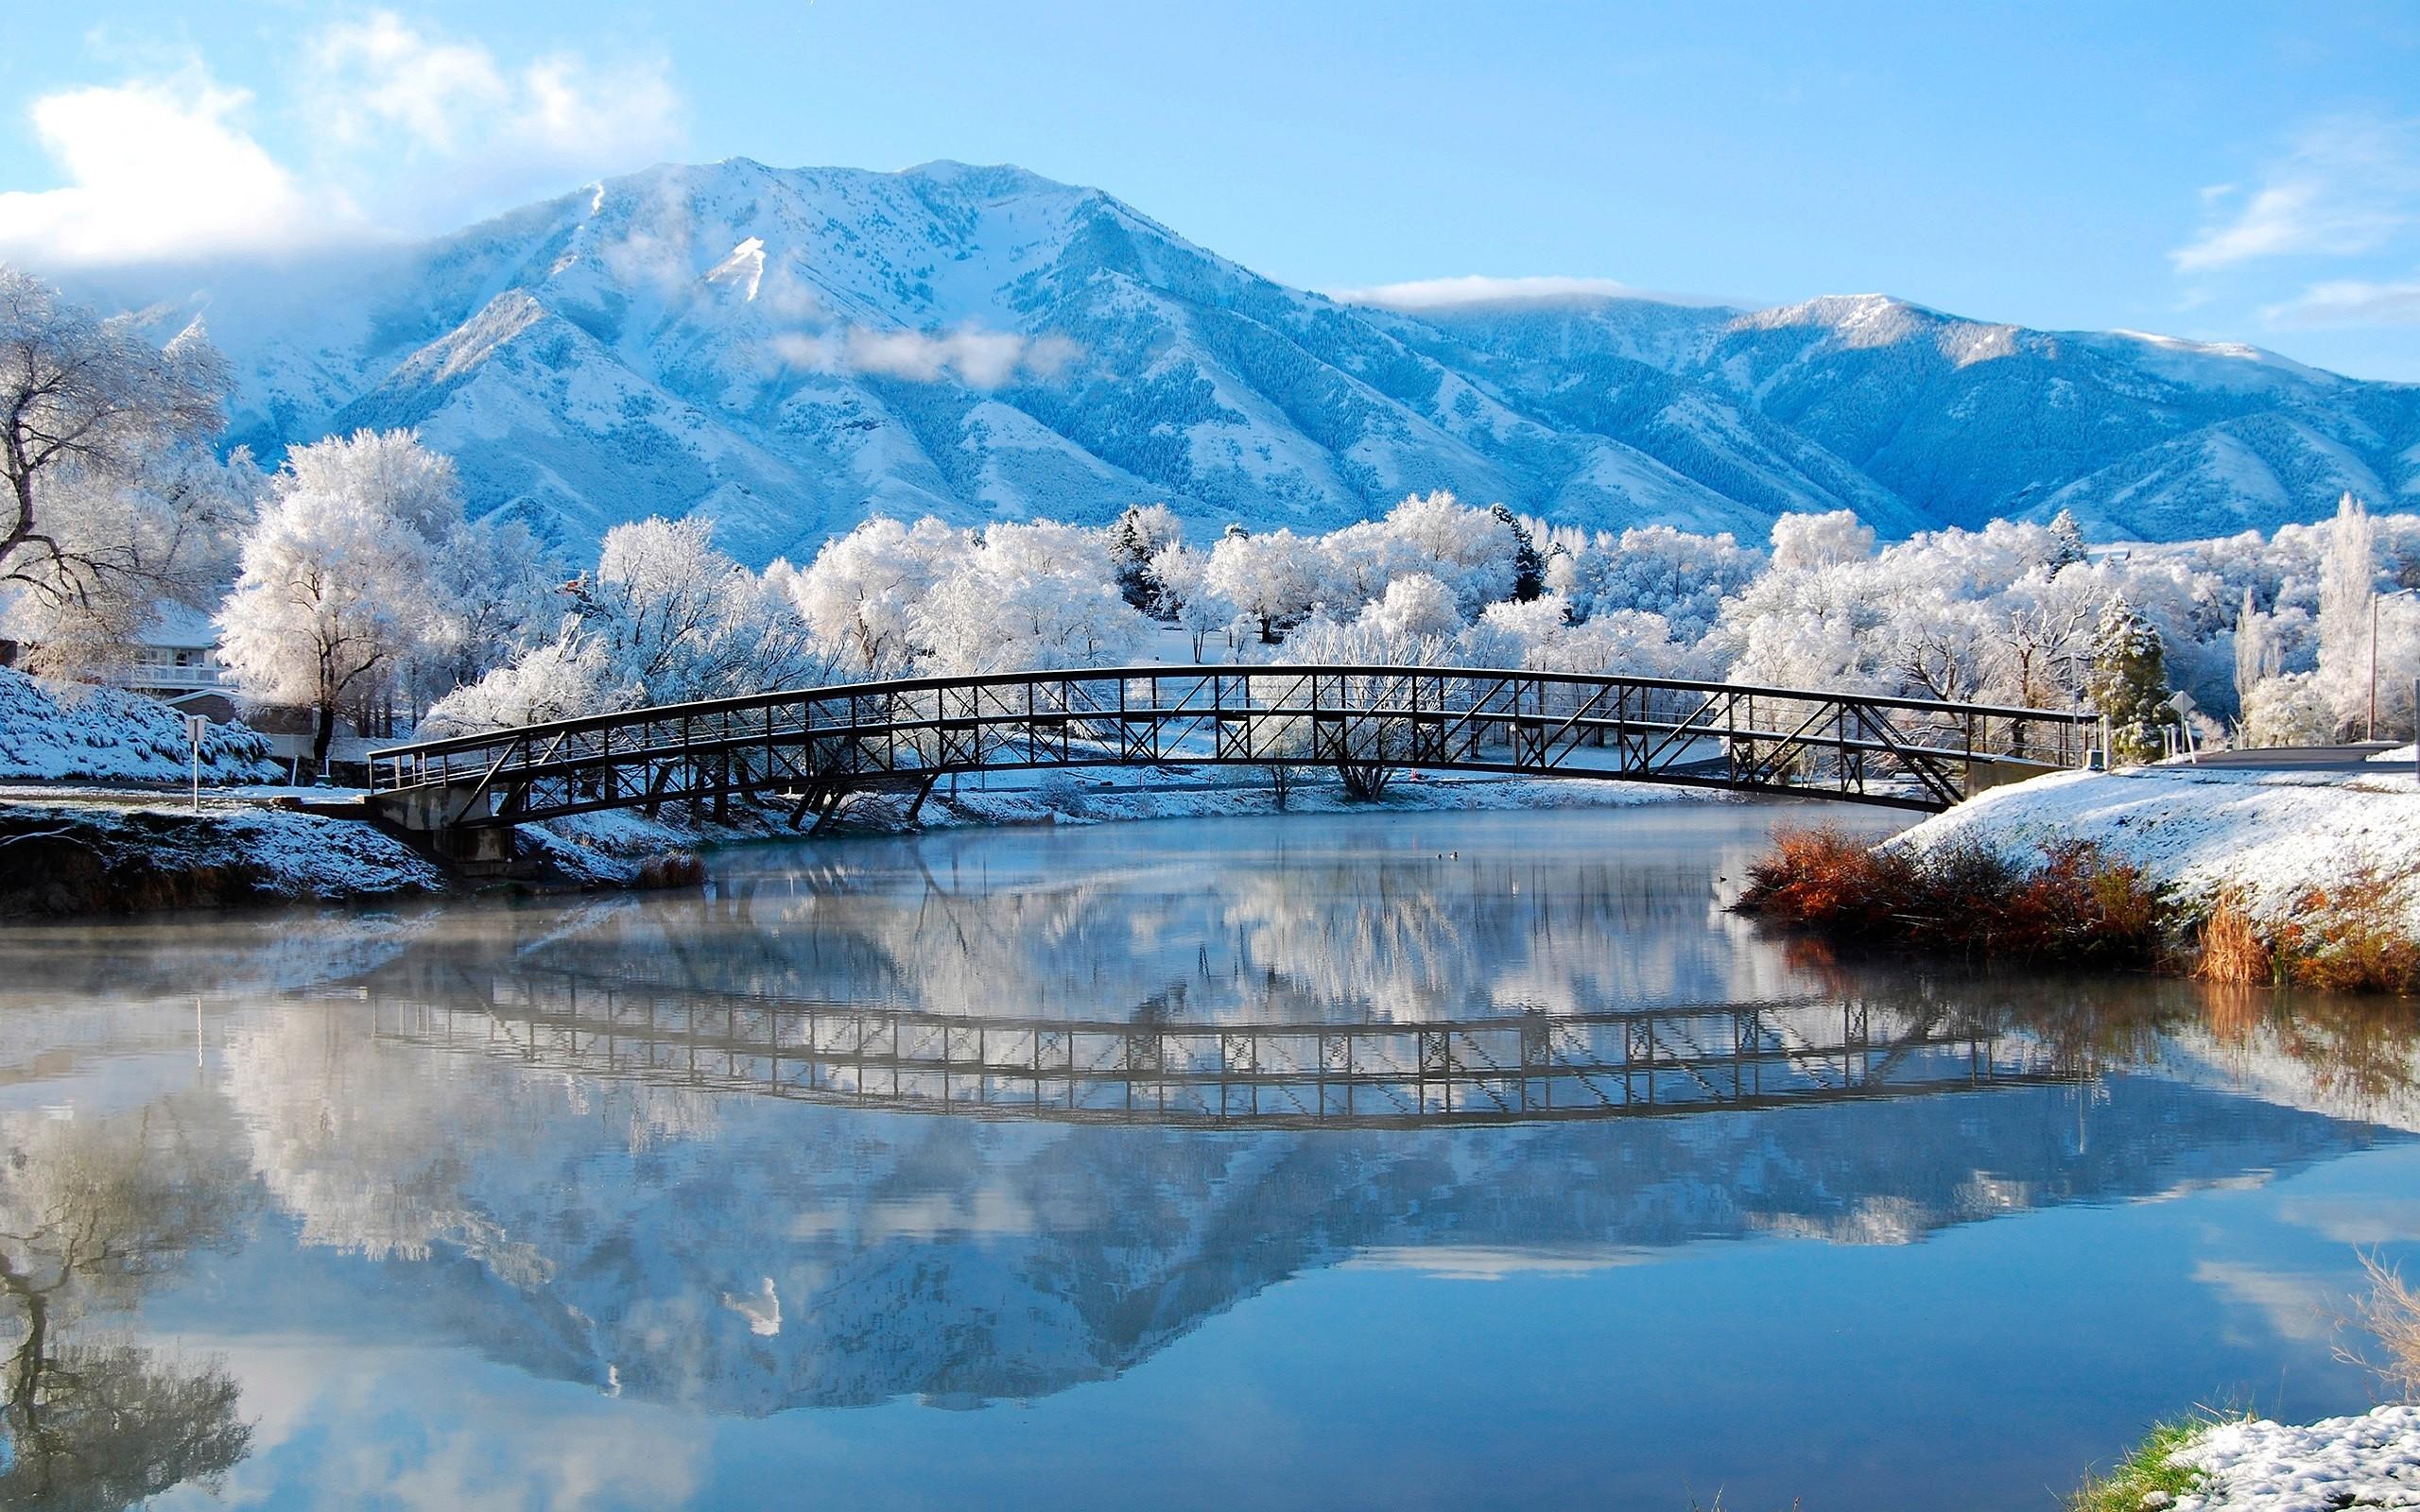 Winter Mountain Desktop Backgrounds (41 Wallpapers)